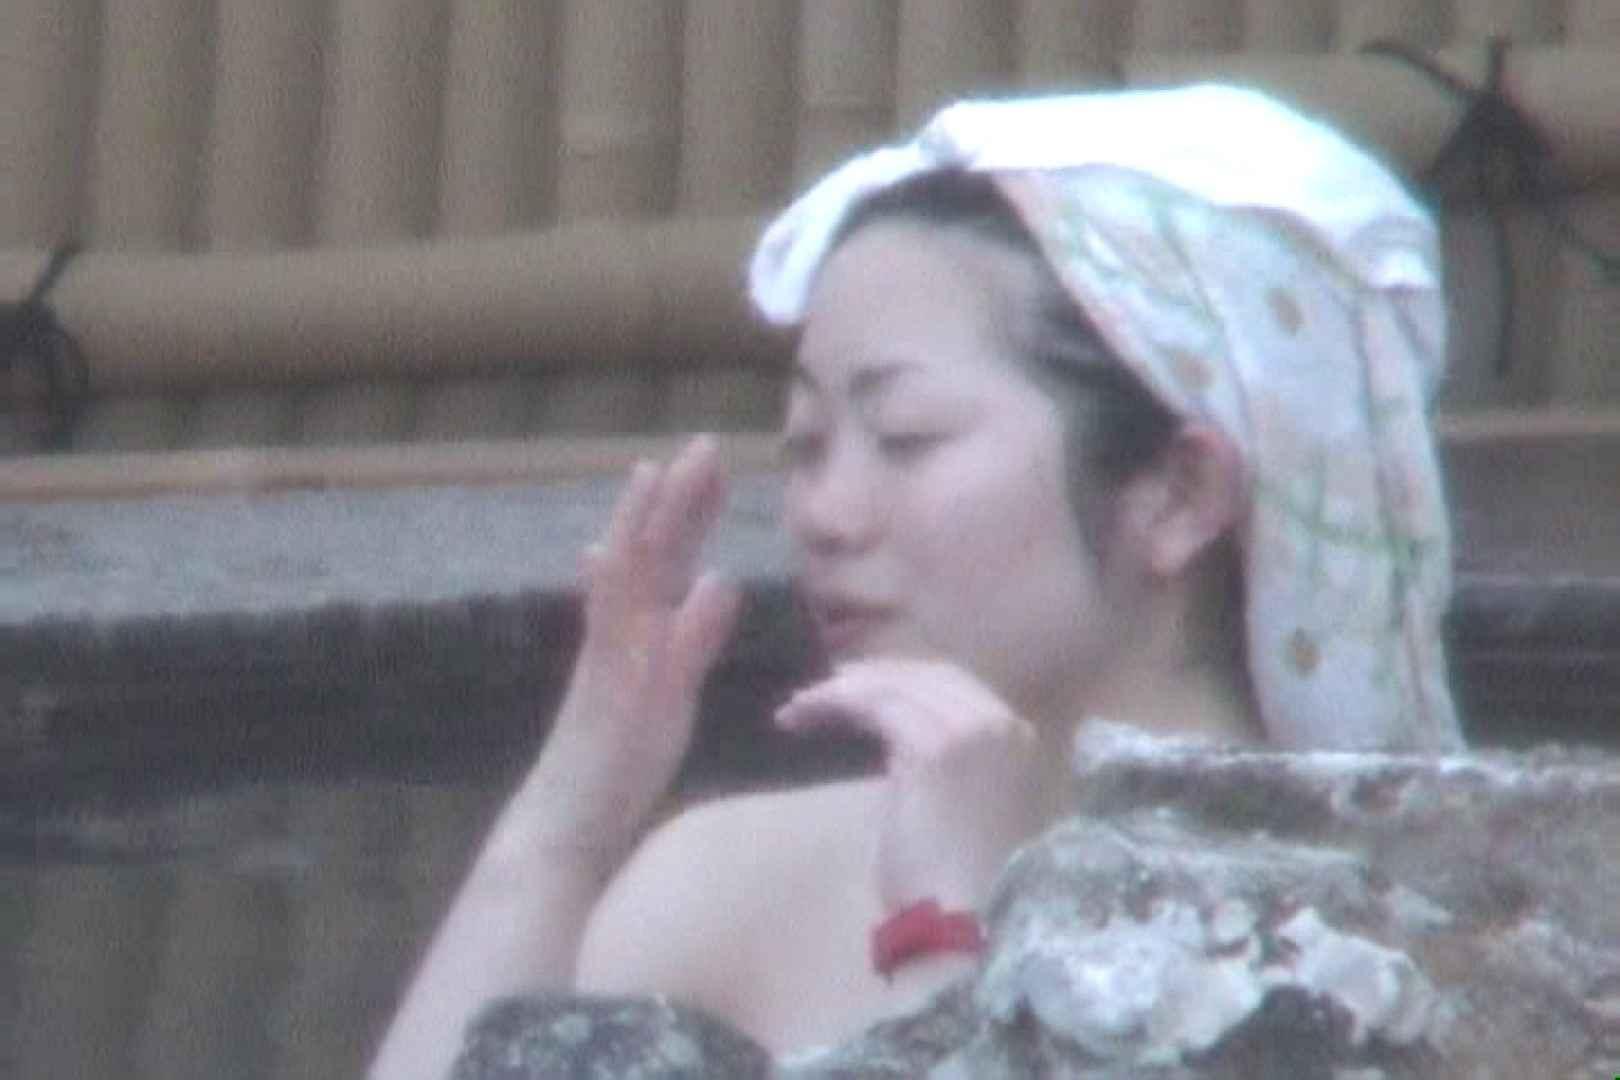 Aquaな露天風呂Vol.86【VIP限定】 露天風呂突入 性交動画流出 94pic 14